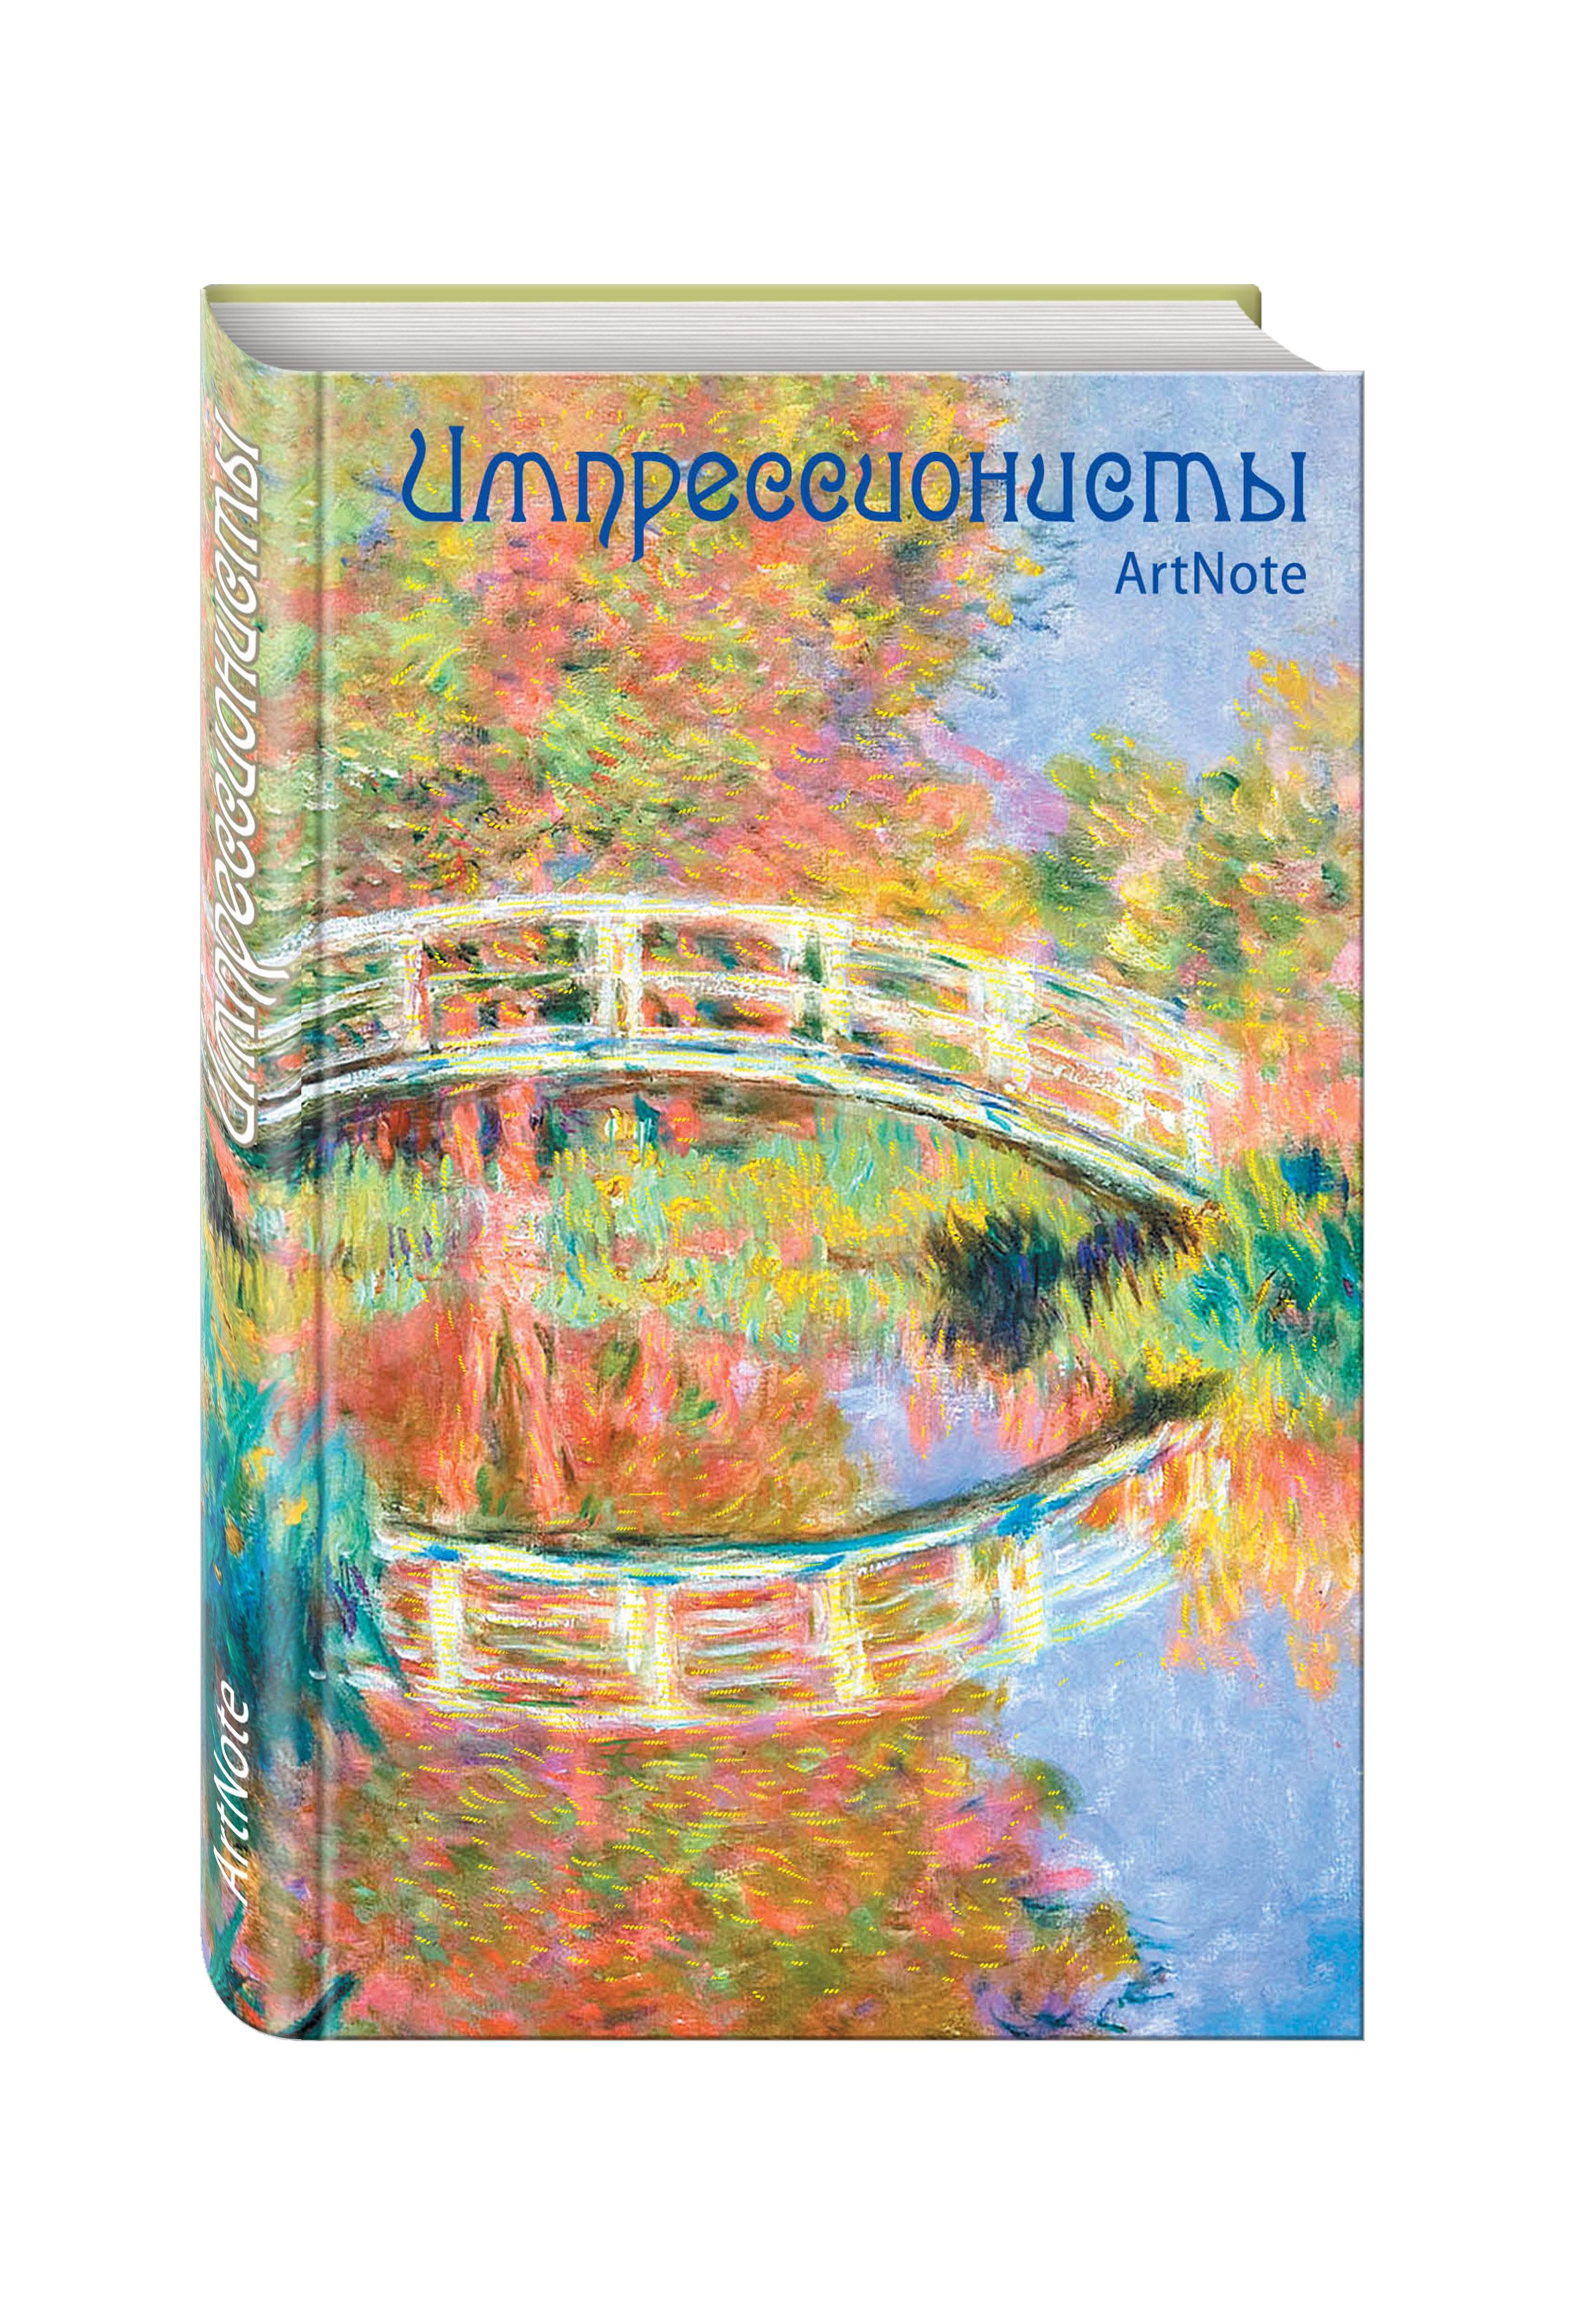 Импрессионисты. ArtNote. Моне. Японский мостик в Живерни яськов в импрессионисты шедевры творчества